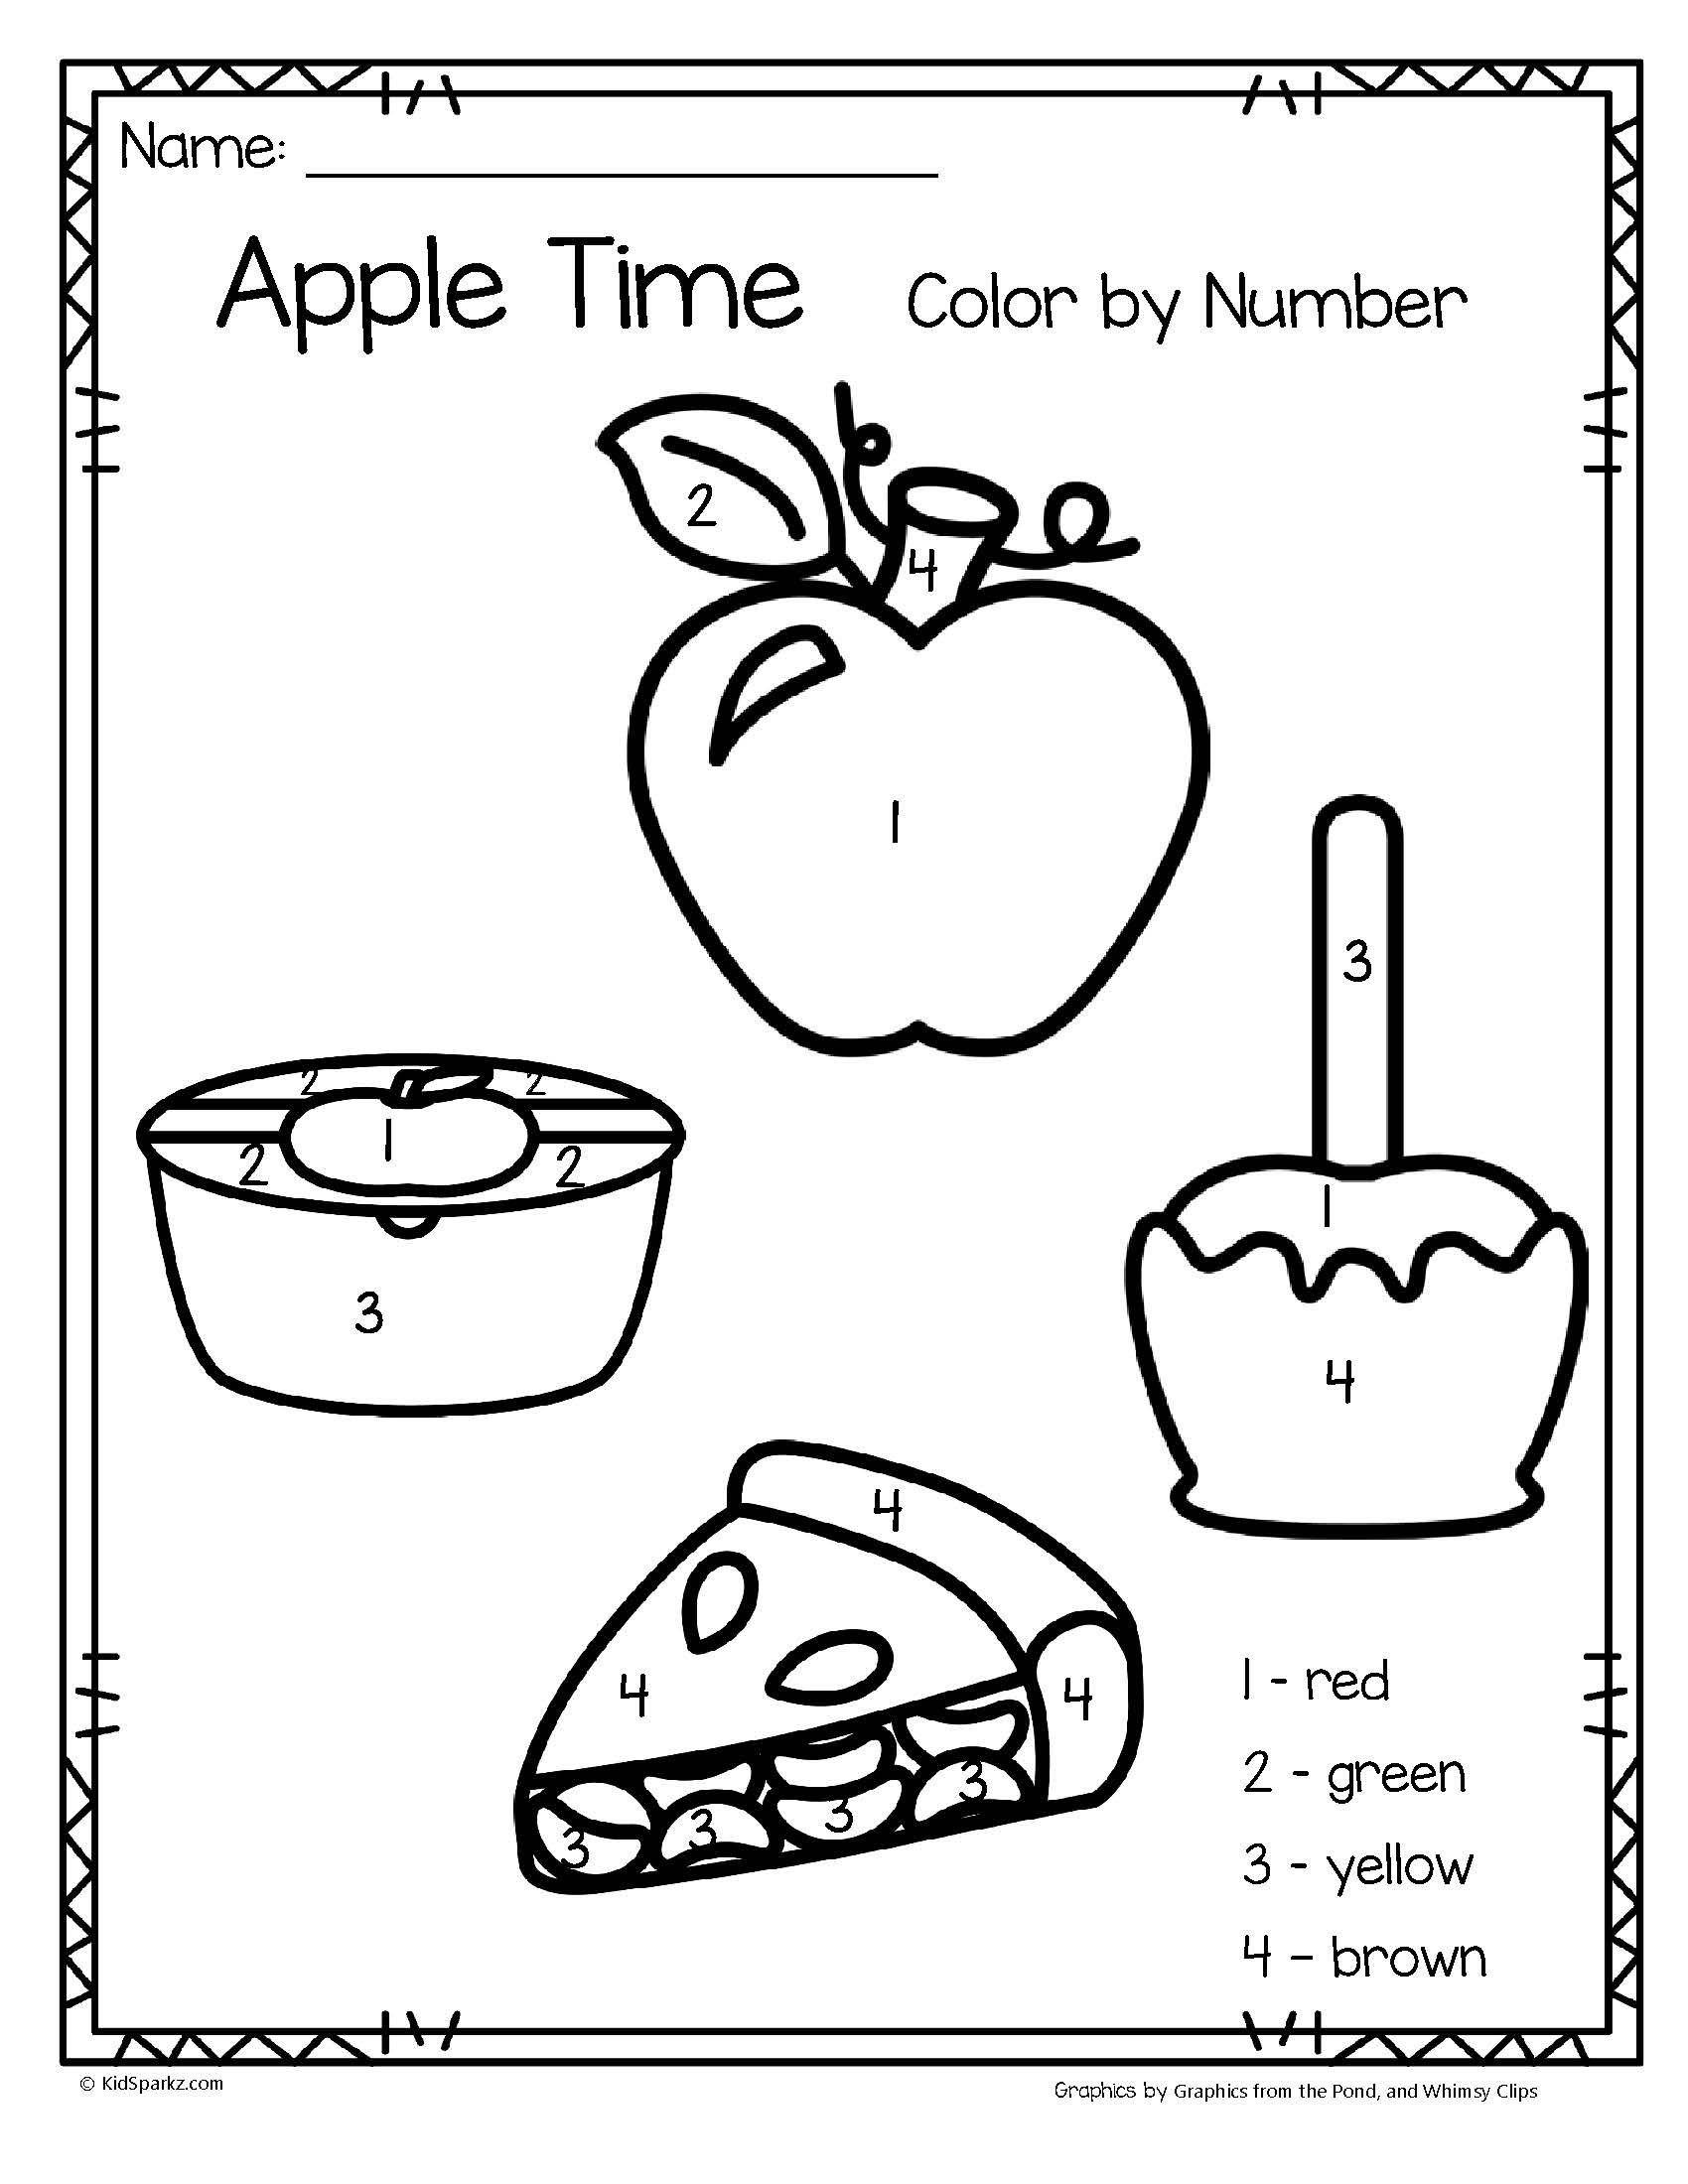 Apple Worksheets Preschool Apple Time Color by Number Printables 3 Pages